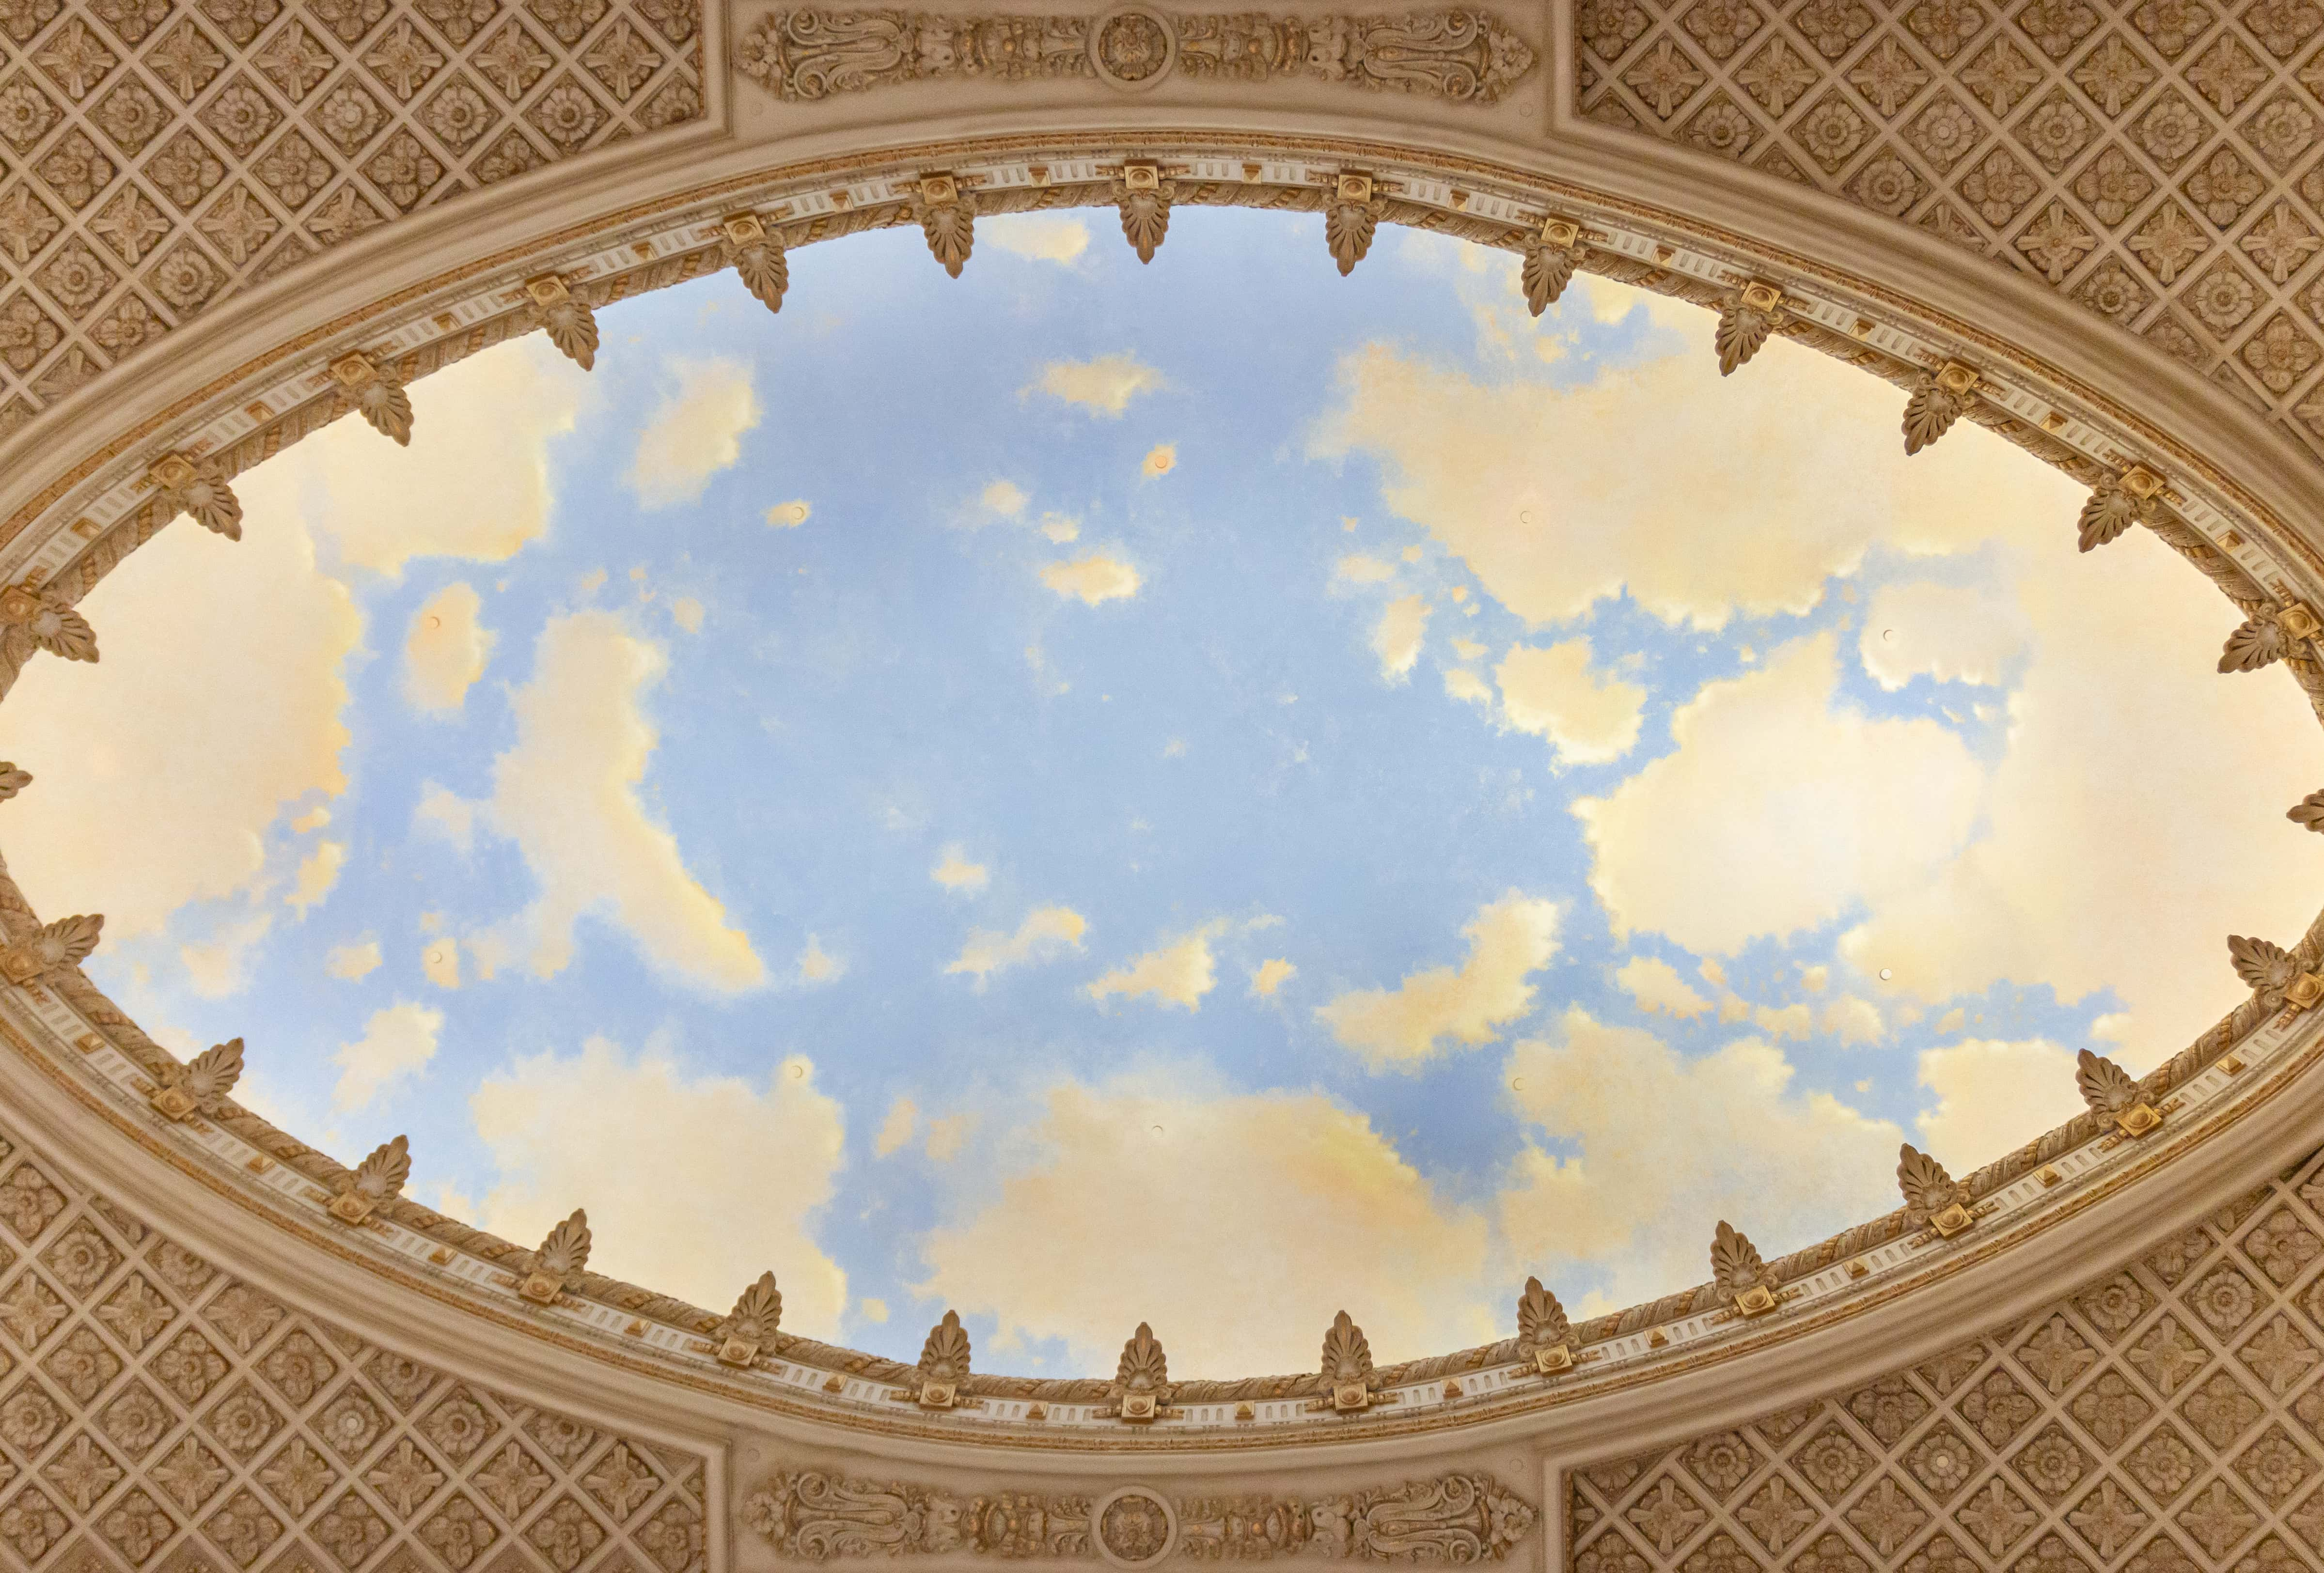 Tower Theatre Sky Mural